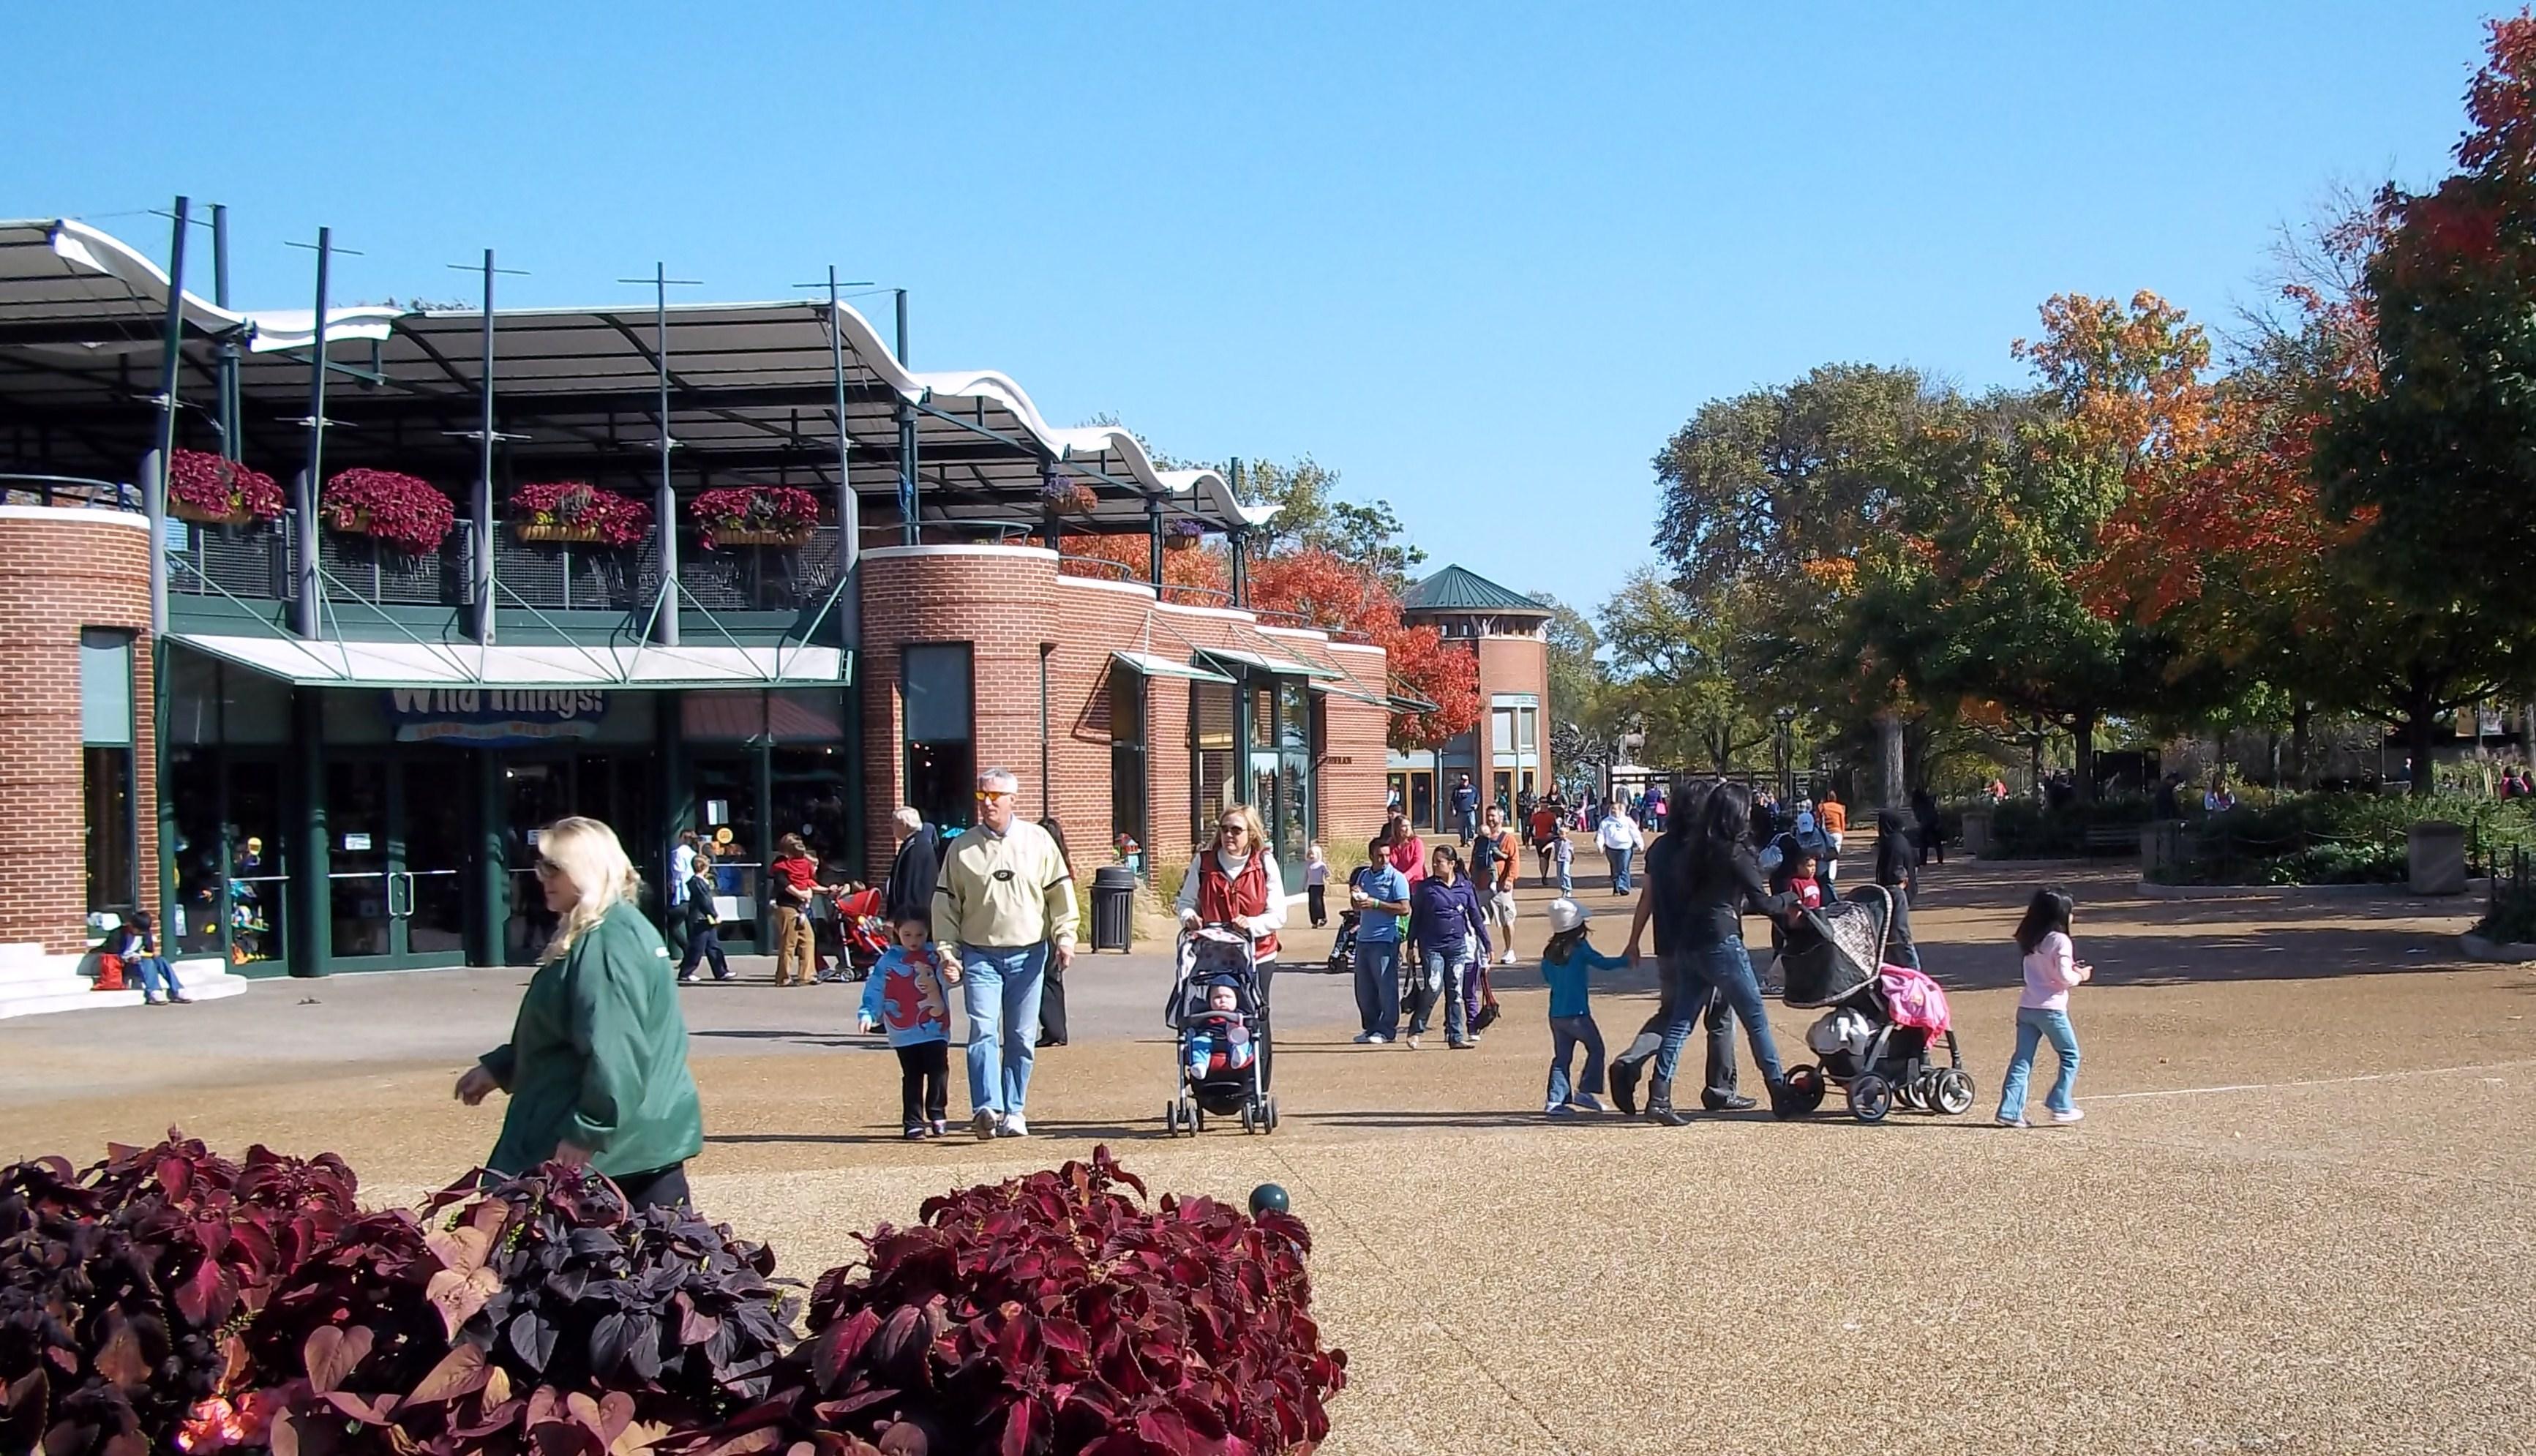 File:Lincoln Park Zoo Main.JPG - Wikimedia Commons